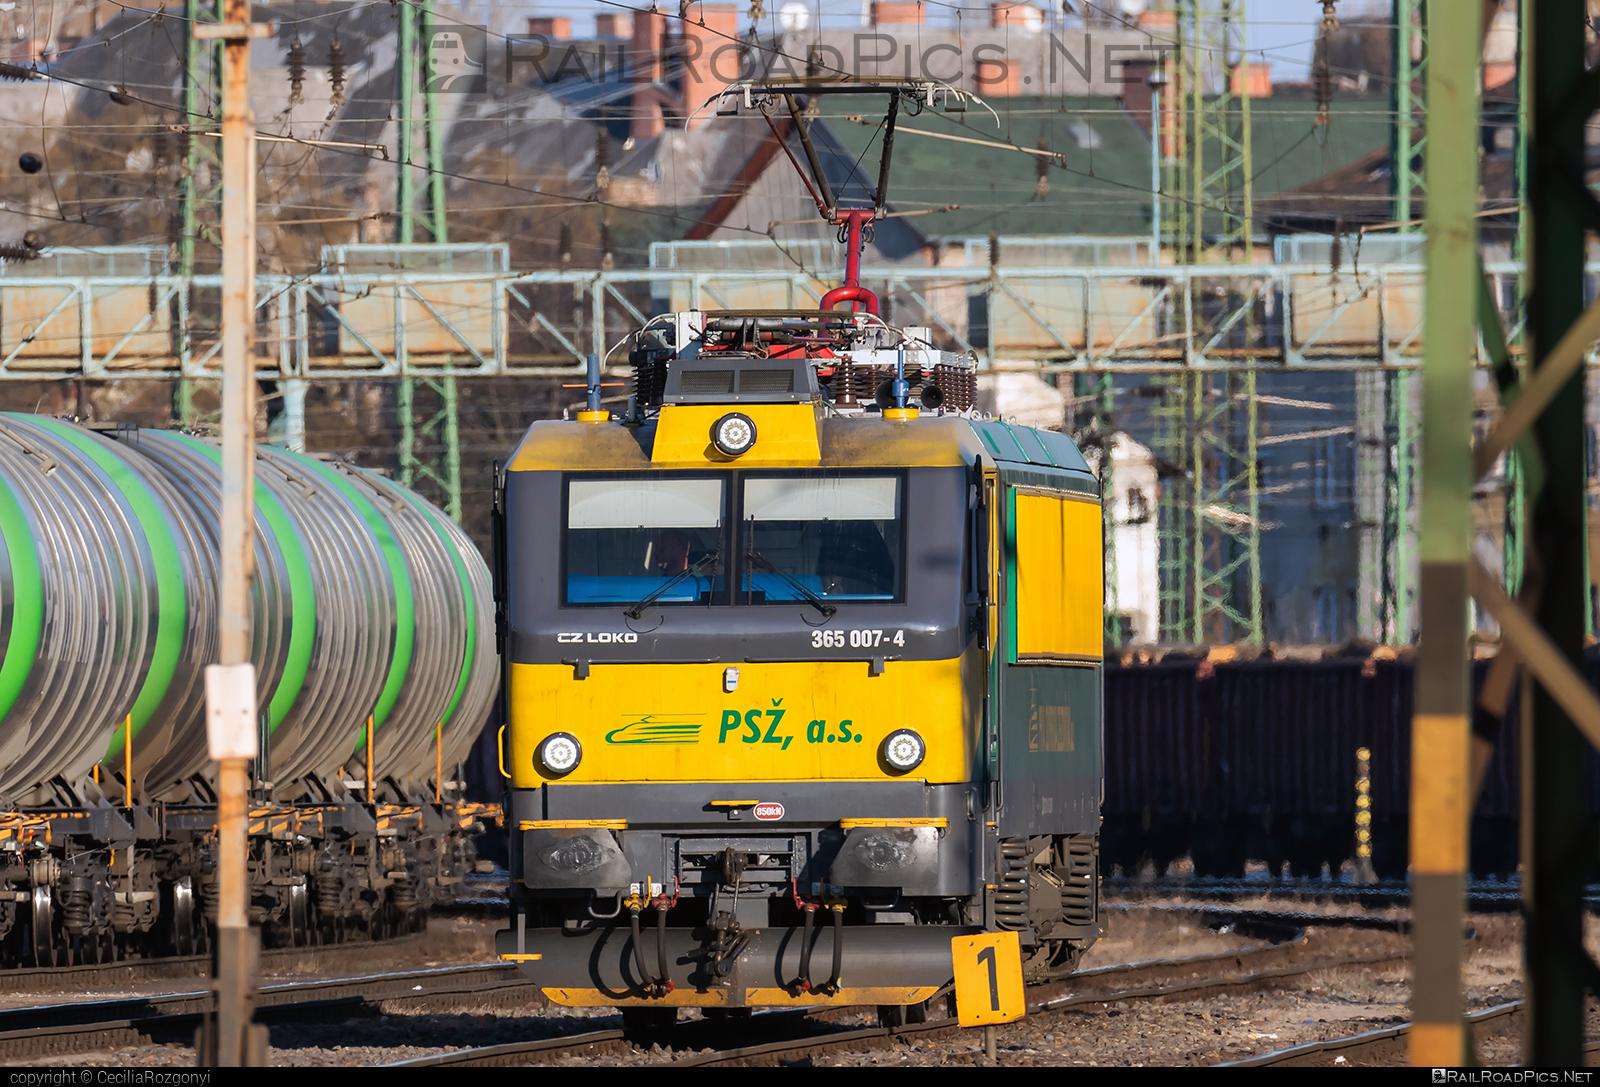 CZ LOKO EffiLiner 3000 - 365 007-4 operated by Prvá Slovenská železničná, a.s. #belgicanka #czloko #czlokoas #effiliner #effiliner3000 #prvaslovenskazeleznicna #prvaslovenskazeleznicnaas #psz #sncb12 #sncbclass12